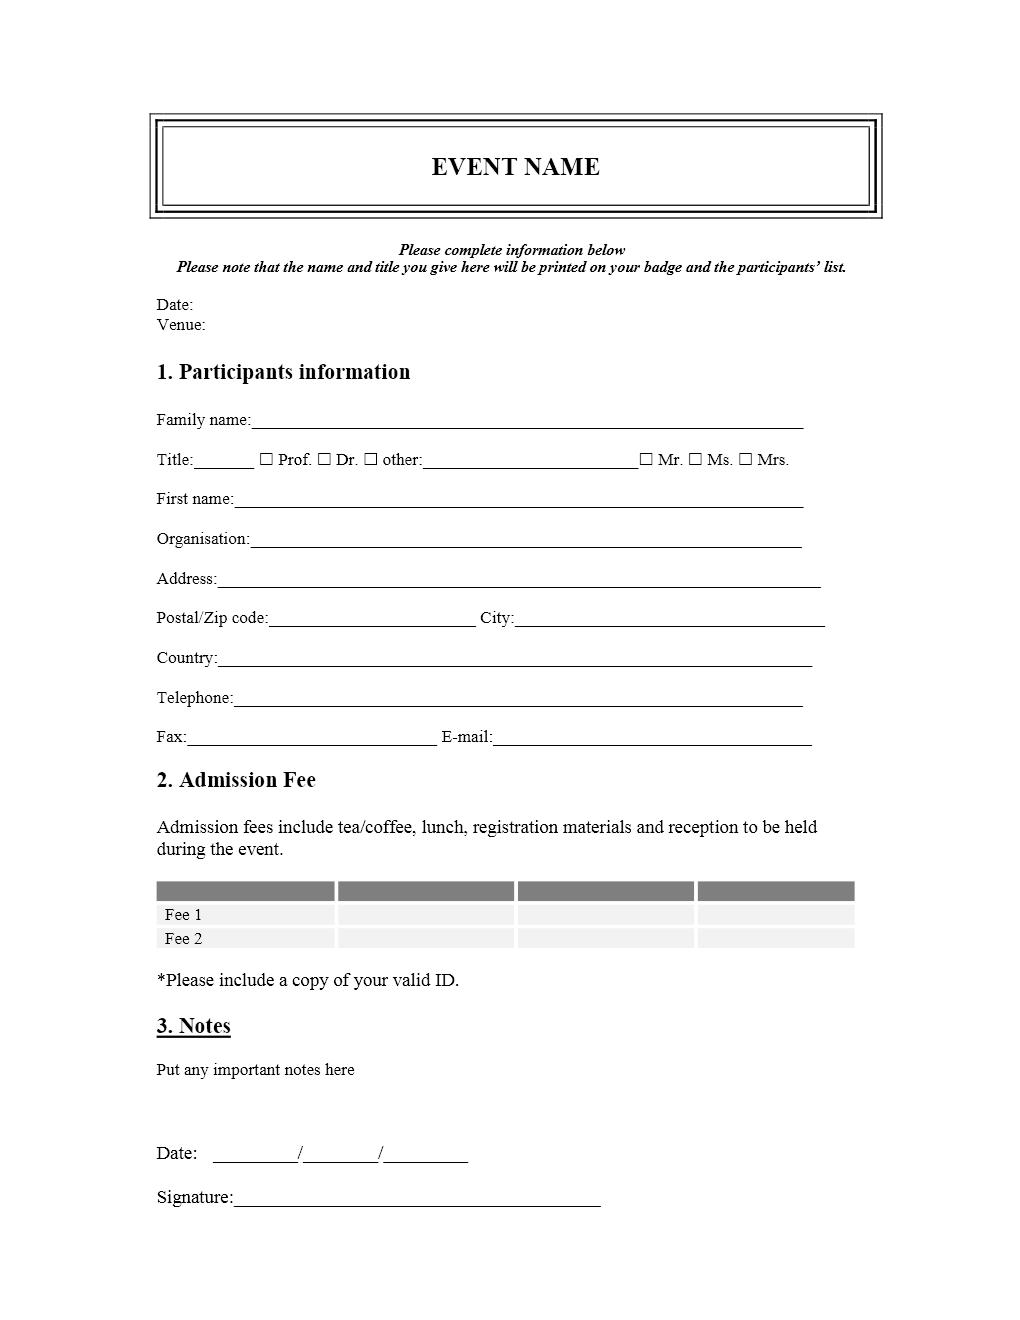 New Customer Registration Form Template teacher resume template word